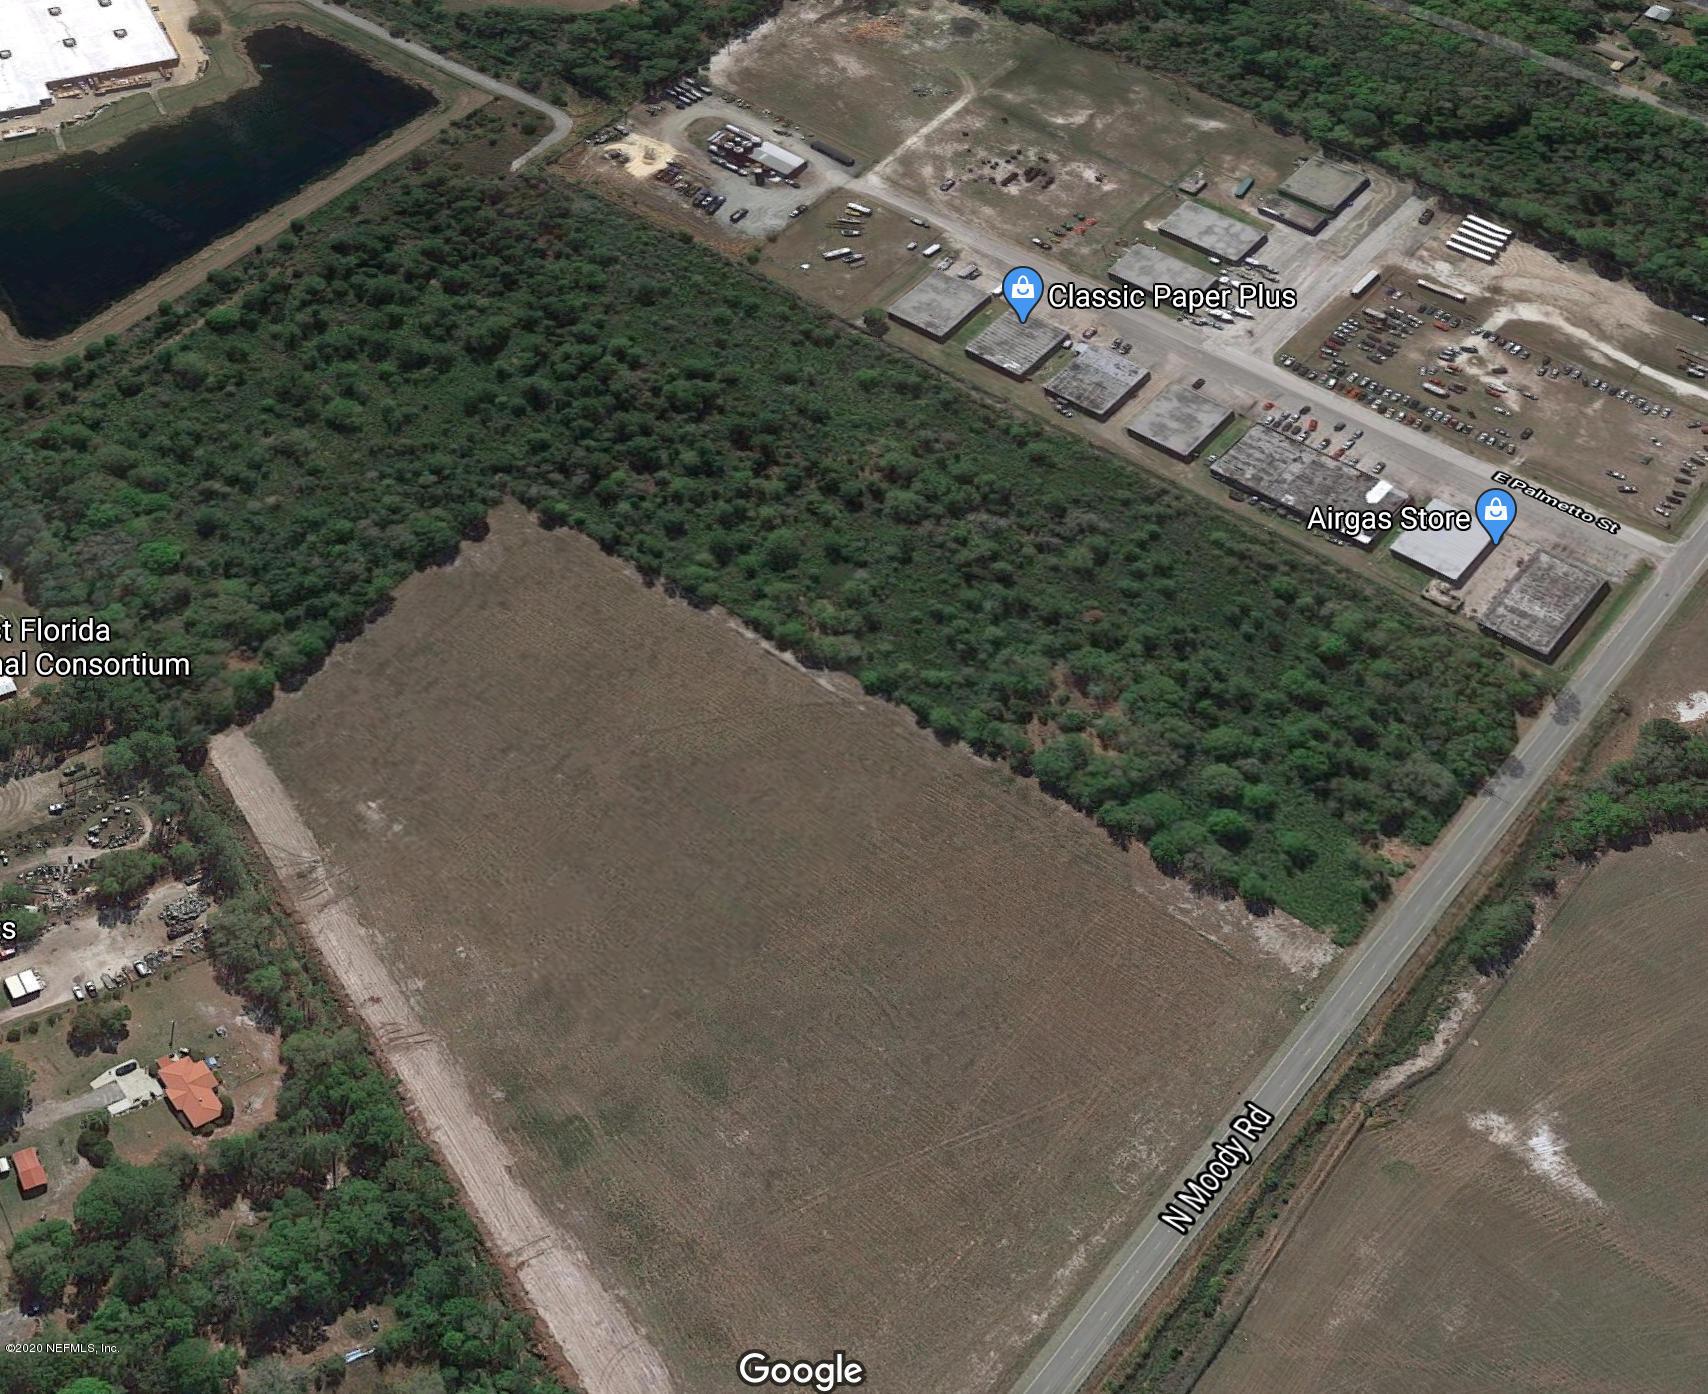 0 MOODY, PALATKA, FLORIDA 32177, ,Vacant land,For sale,MOODY,931378